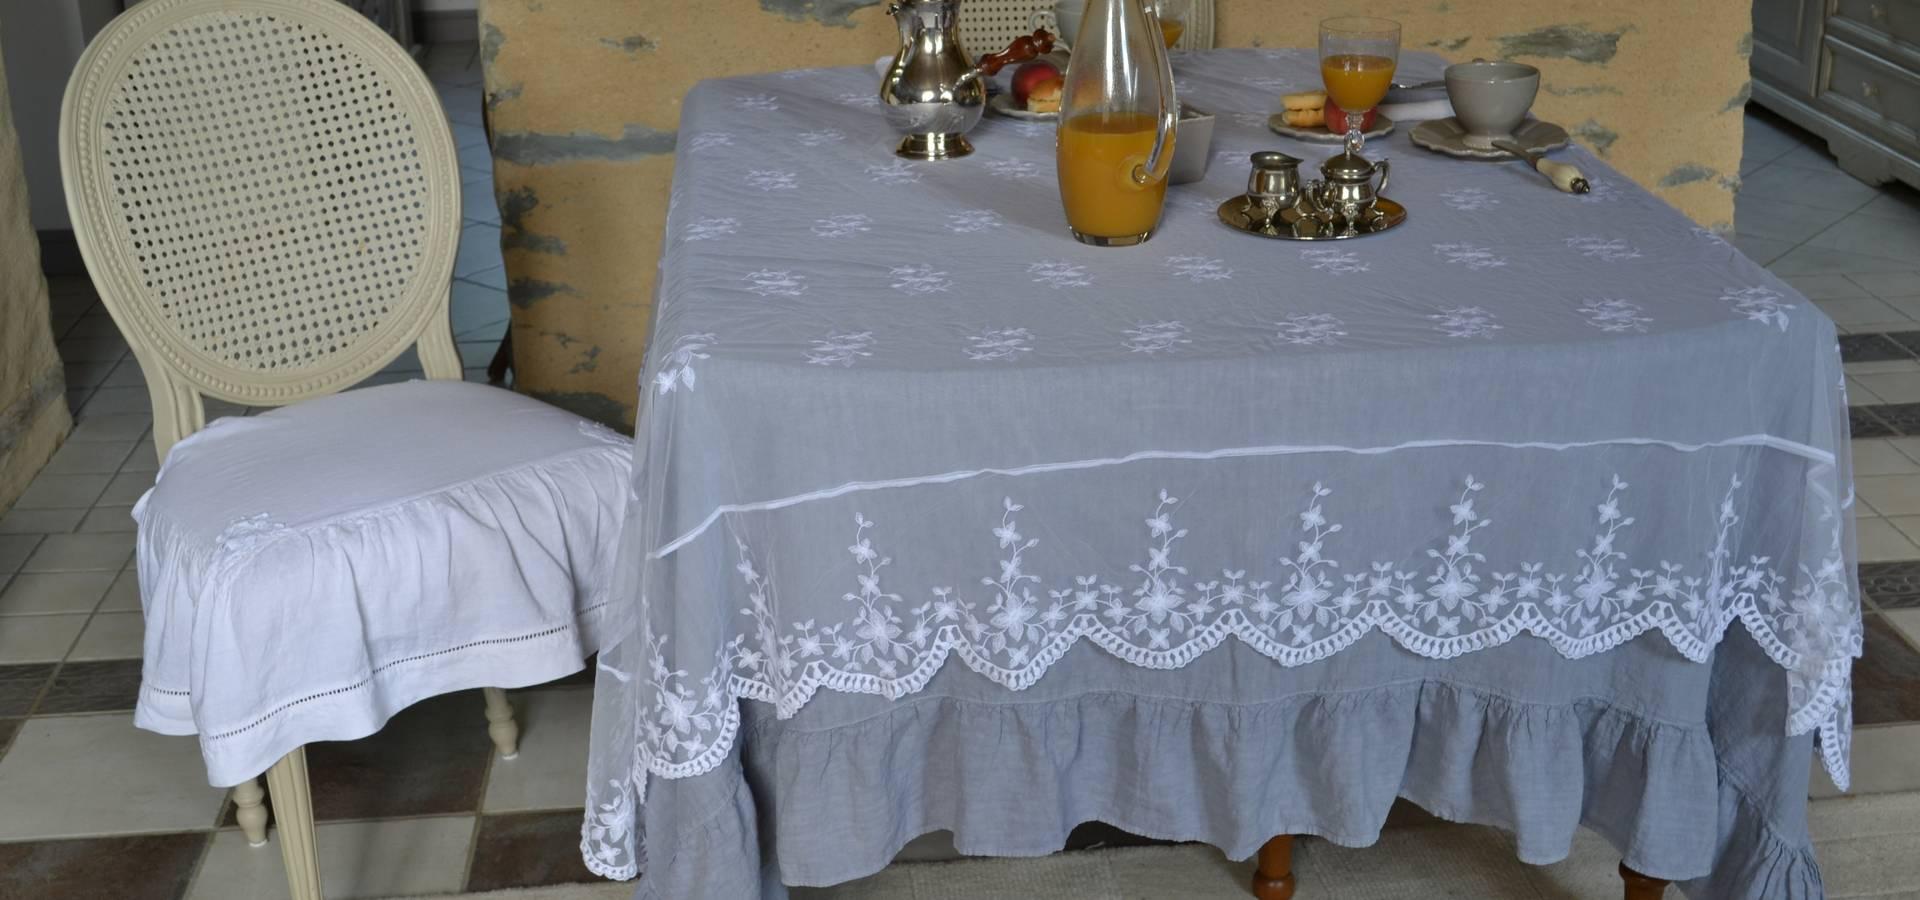 amandine de br velay cr ations profesjonali ci w kategorii tekstylia tapicerki w. Black Bedroom Furniture Sets. Home Design Ideas